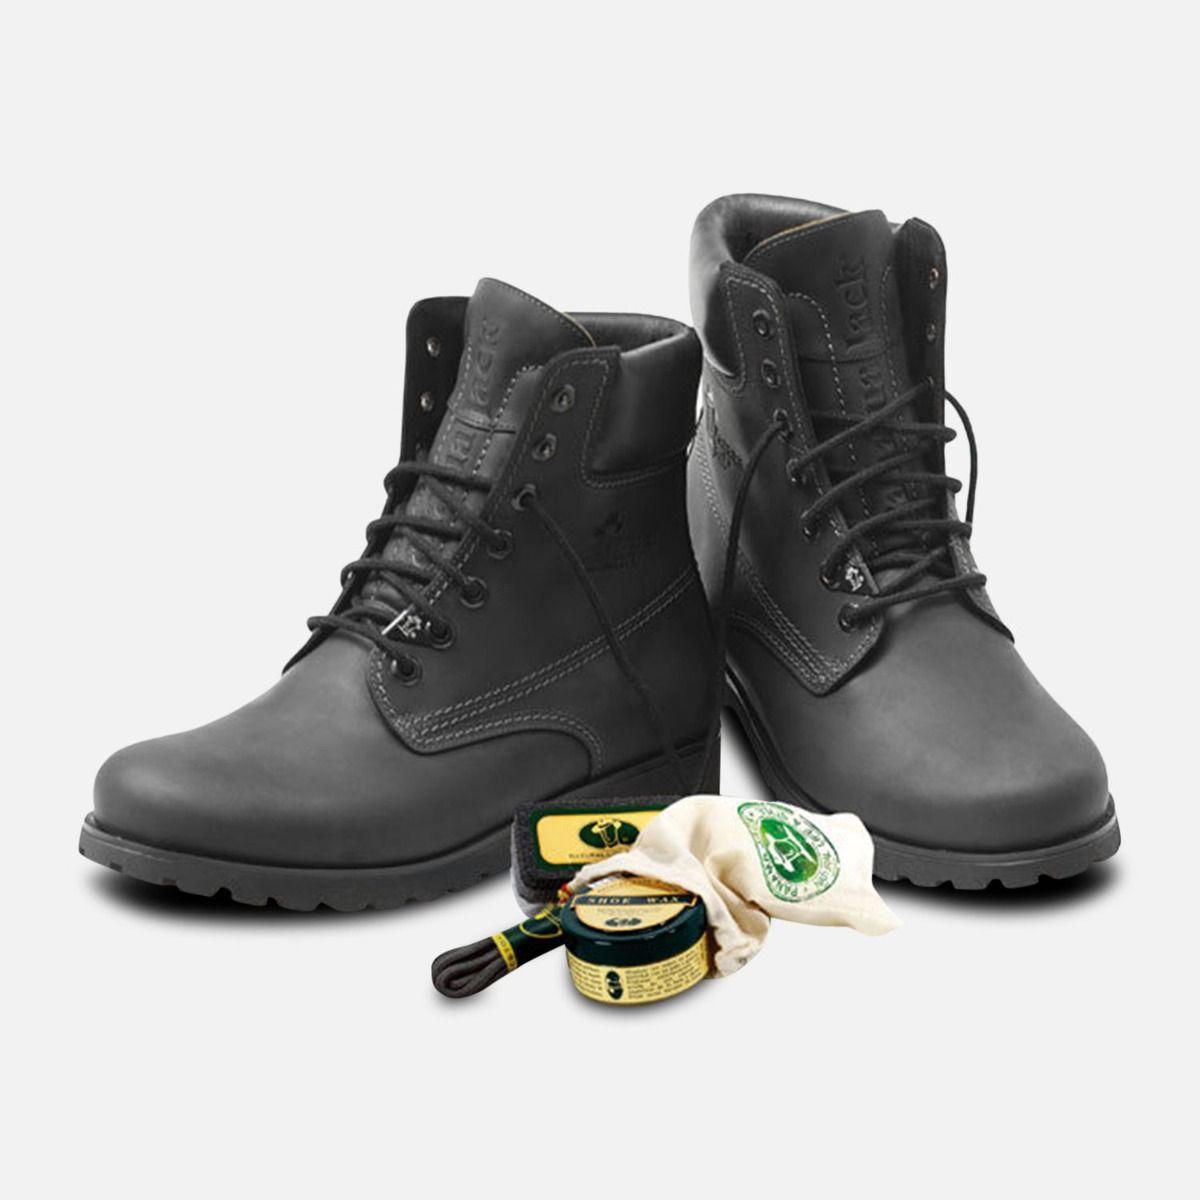 f3e312e609de62 Panama Jack Original Mens Black Napa Boots